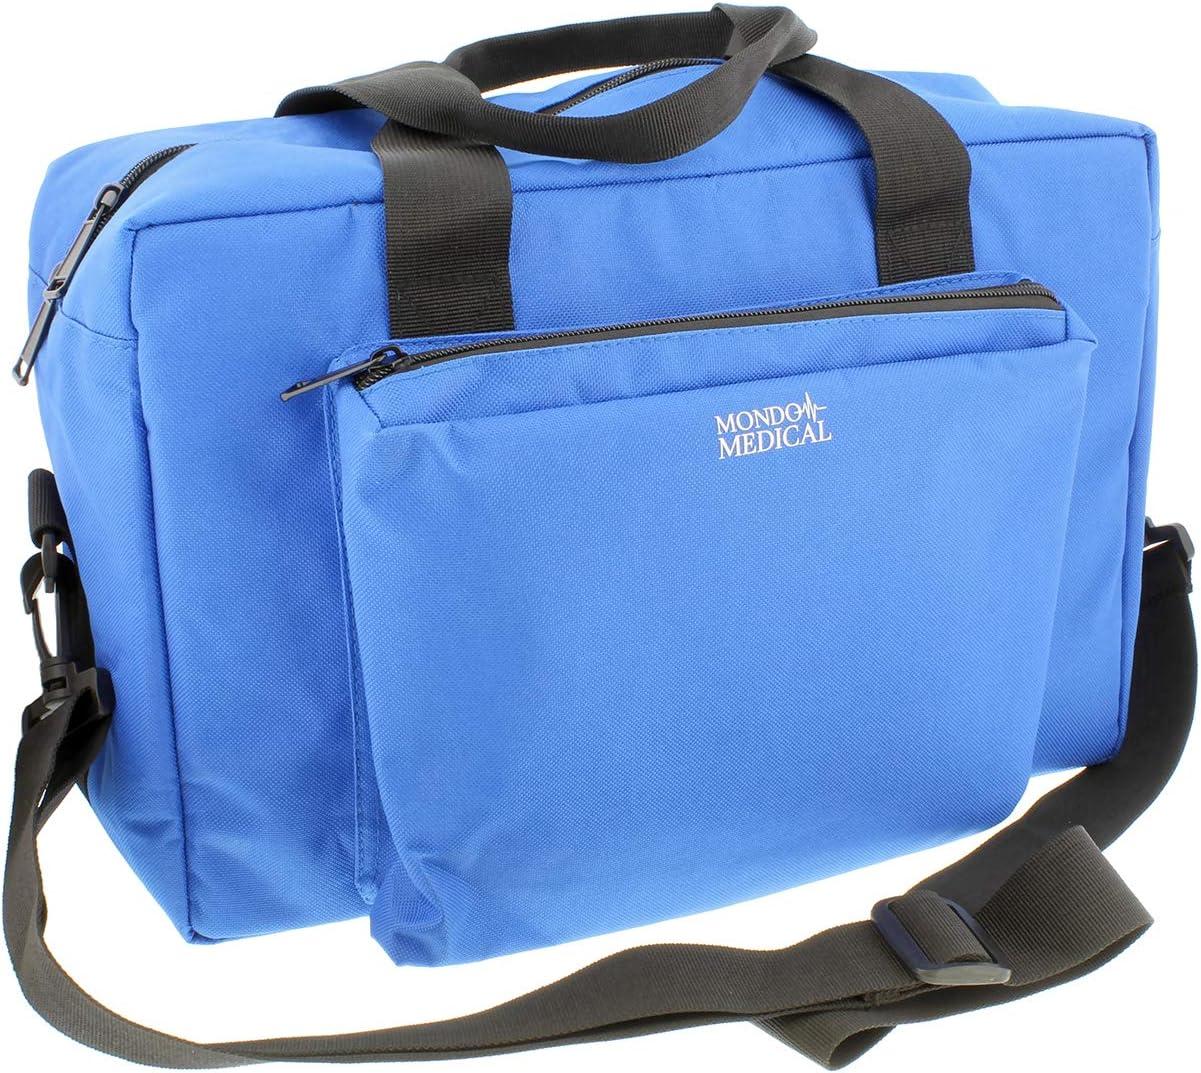 MonMed Blue Medical Bag - Nurse Accessories Nursing School Supplies, Medical Equipment Bag, Nurse Bag in Blue Nylon